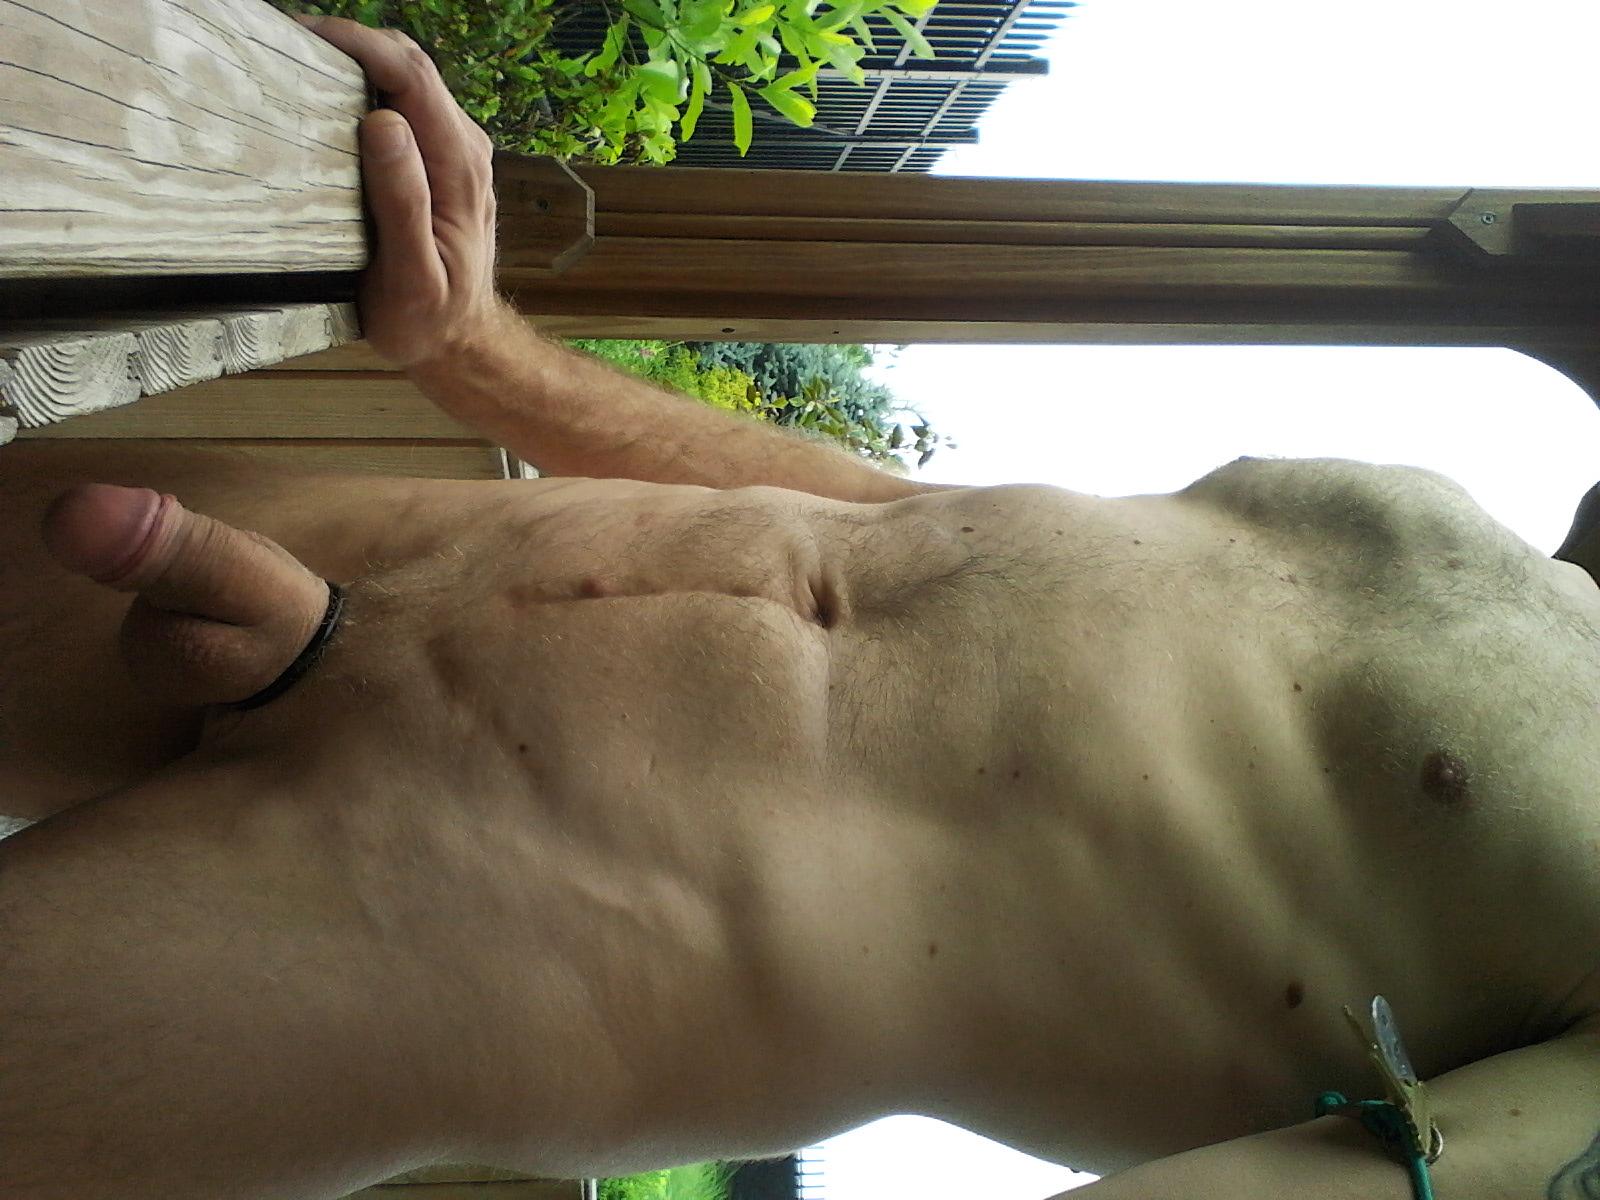 LuckyBulldog7743